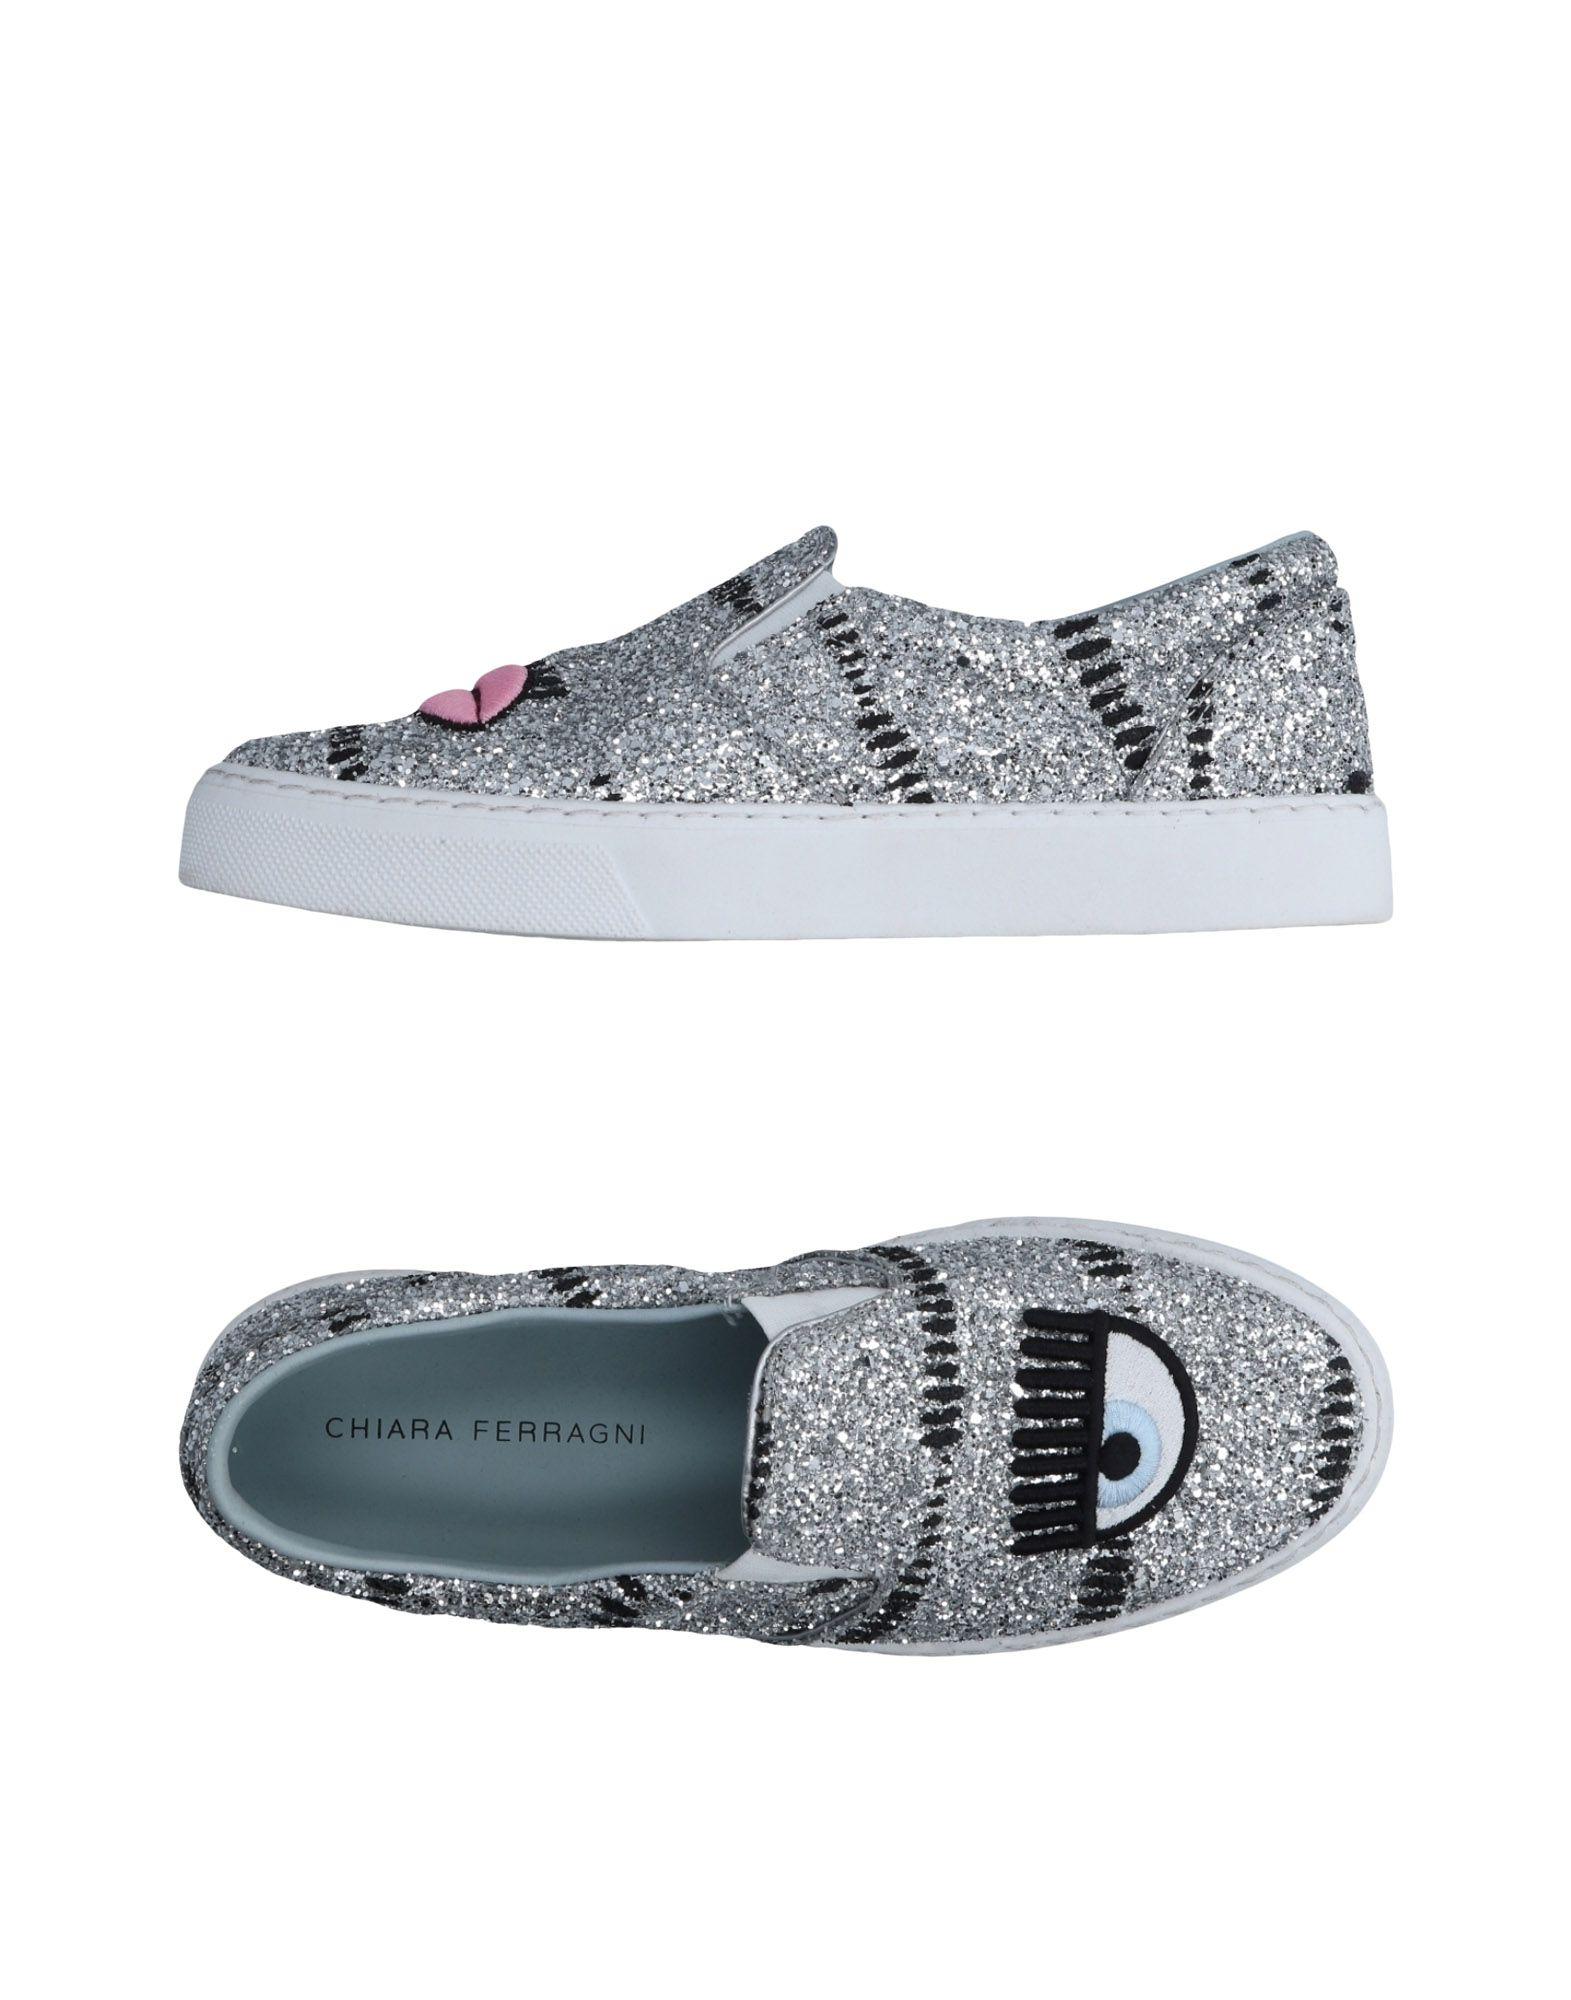 Chiara Ferragni Sneakers Sneakers - Women Chiara Ferragni Sneakers Sneakers online on  Canada - 11476225PR c1e610